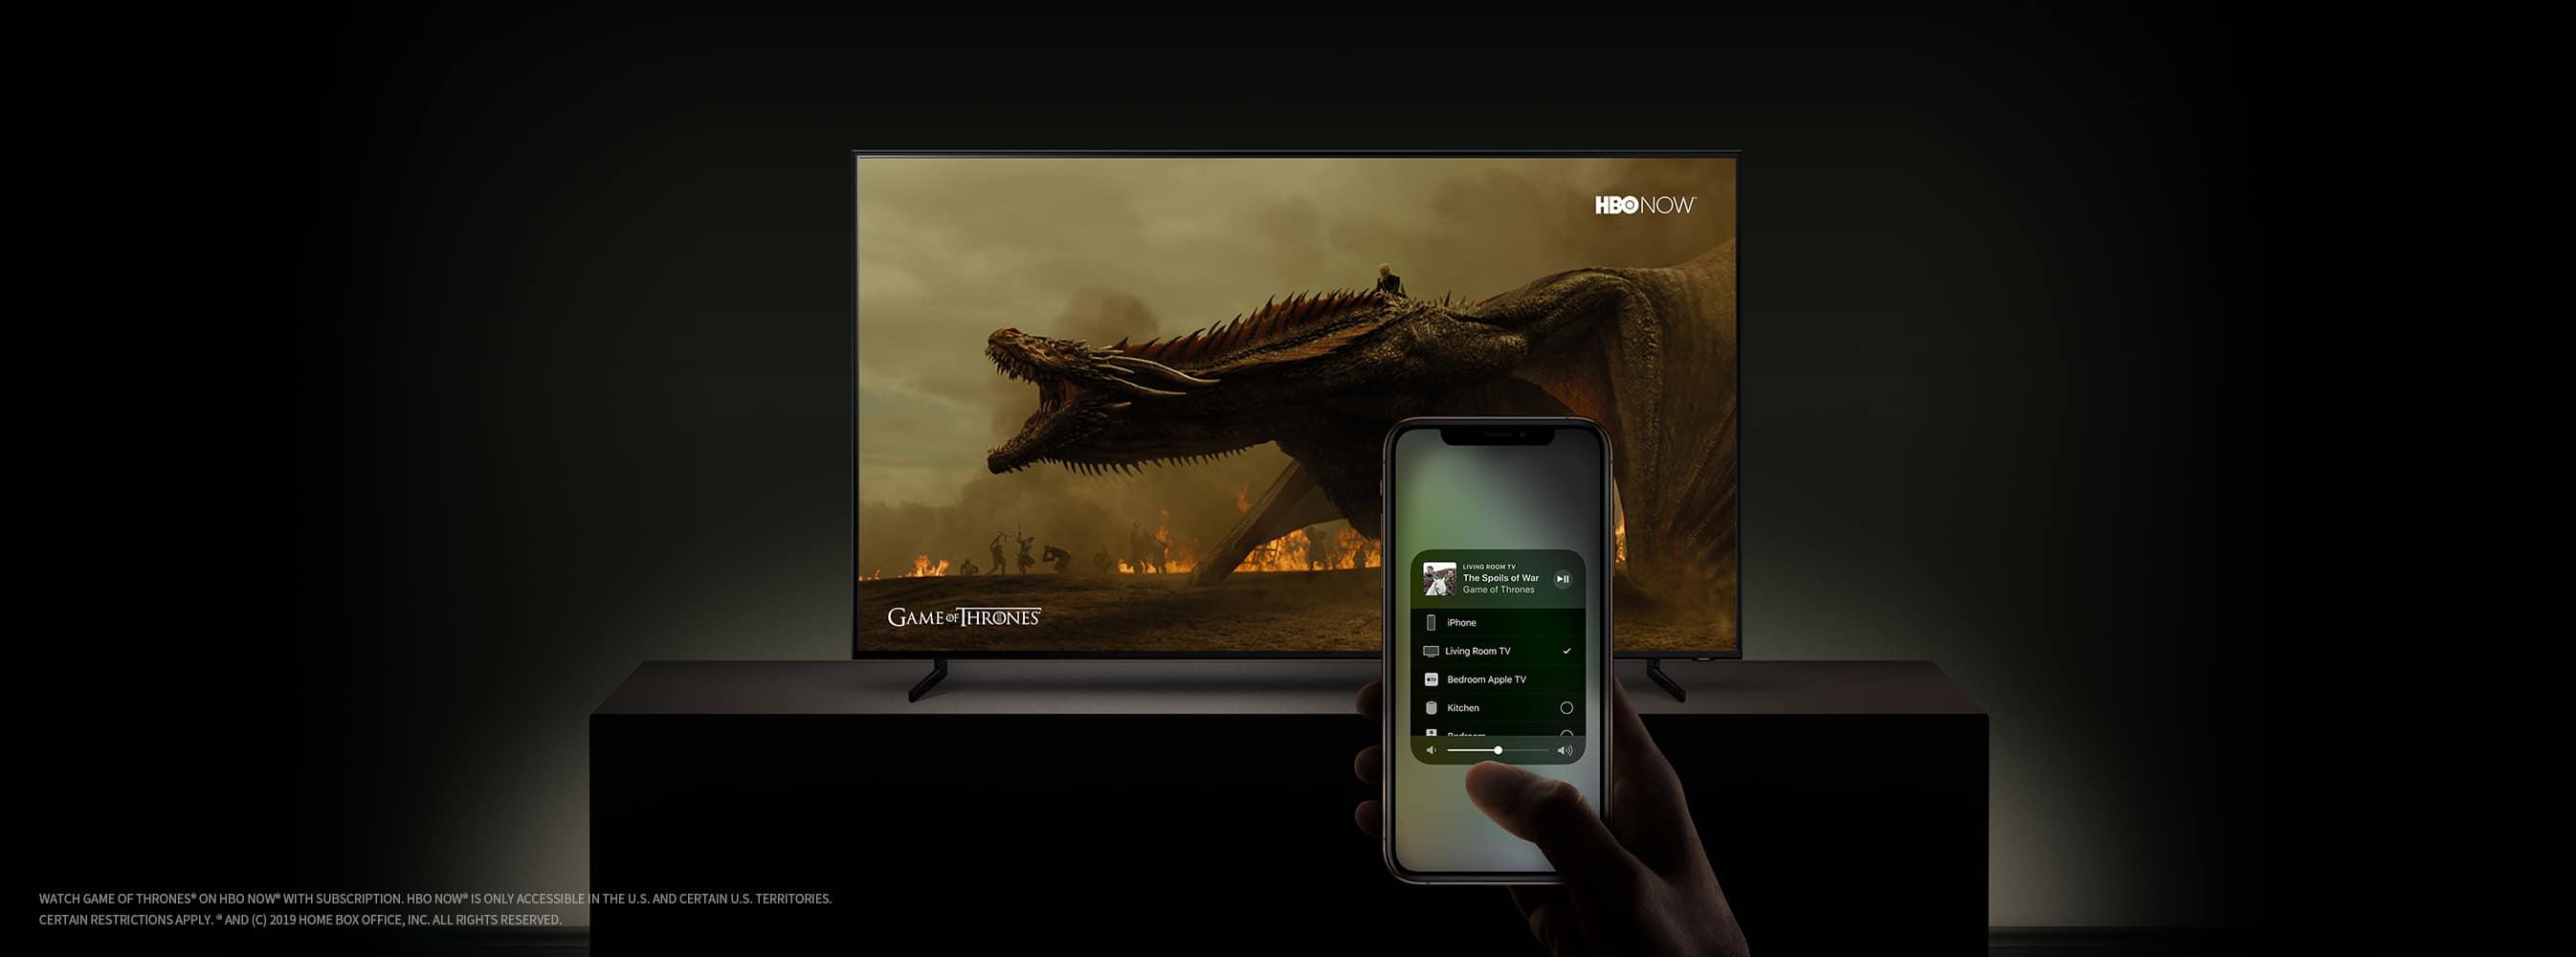 AirPlay 2 Fernseher